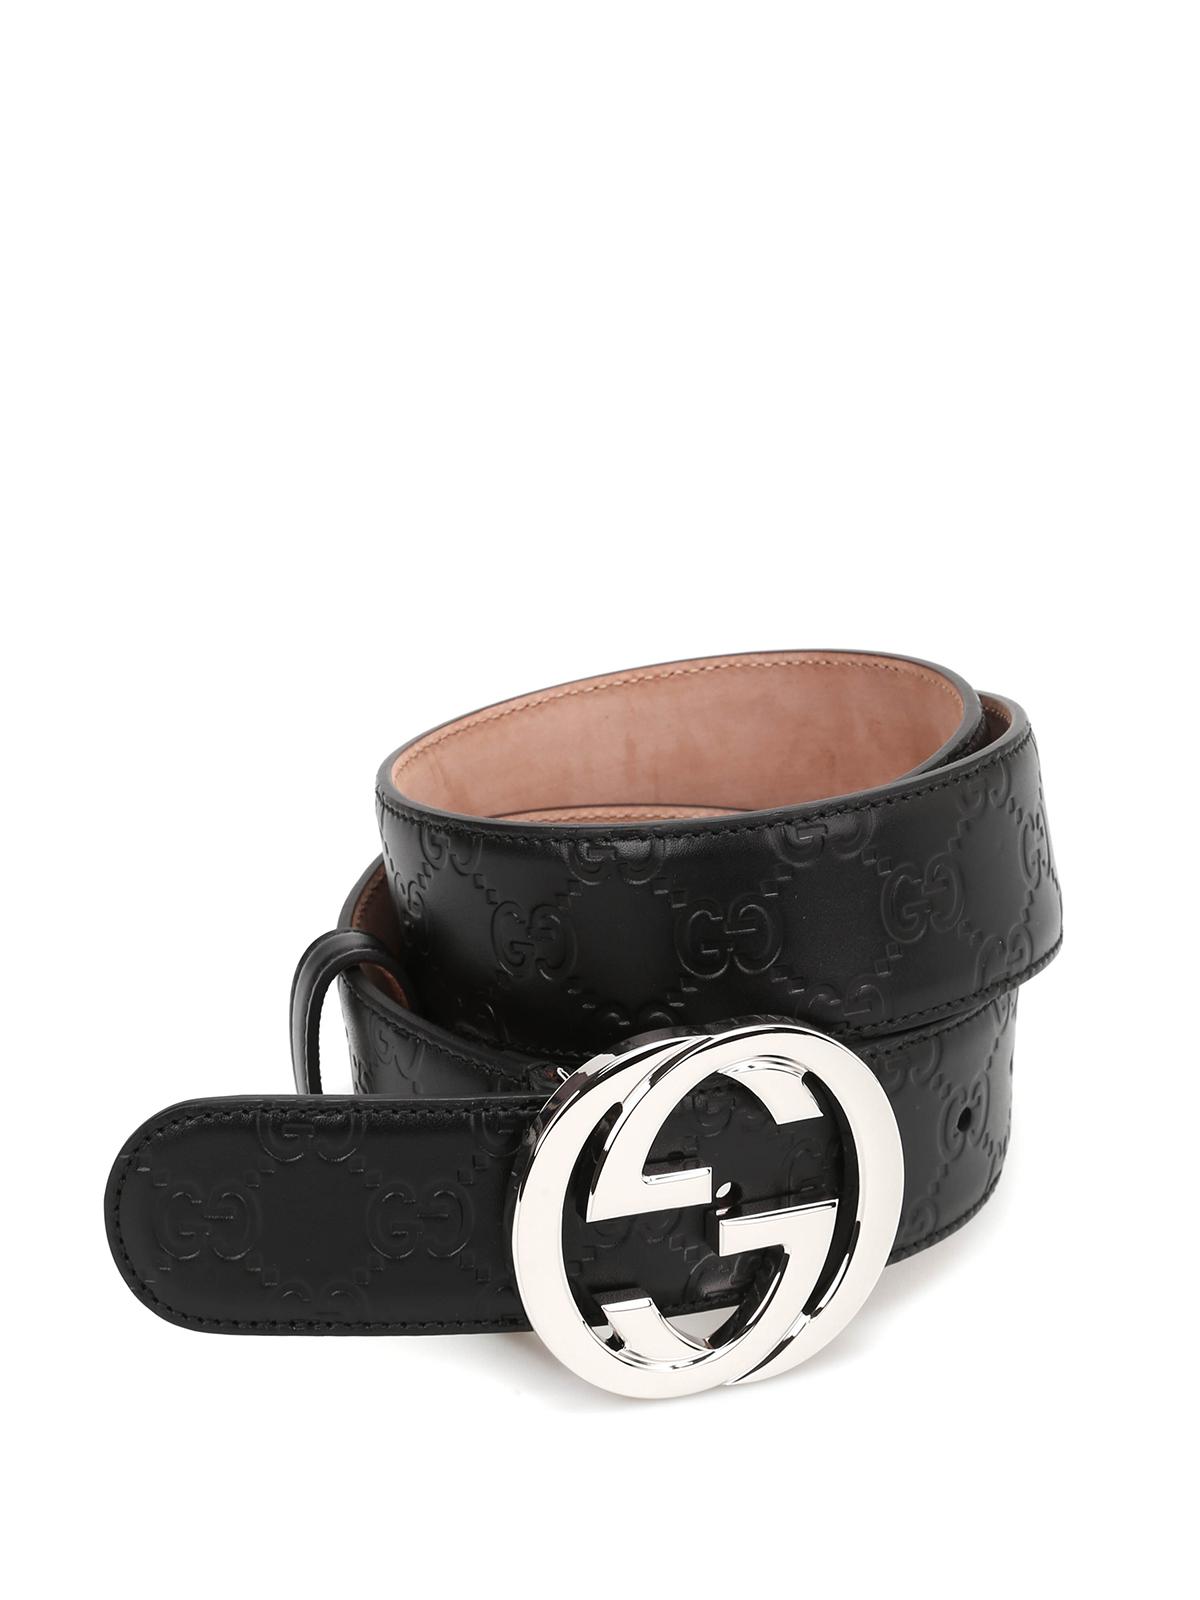 Gucci - Interlocking GG leather belt - belts - 411924 ...